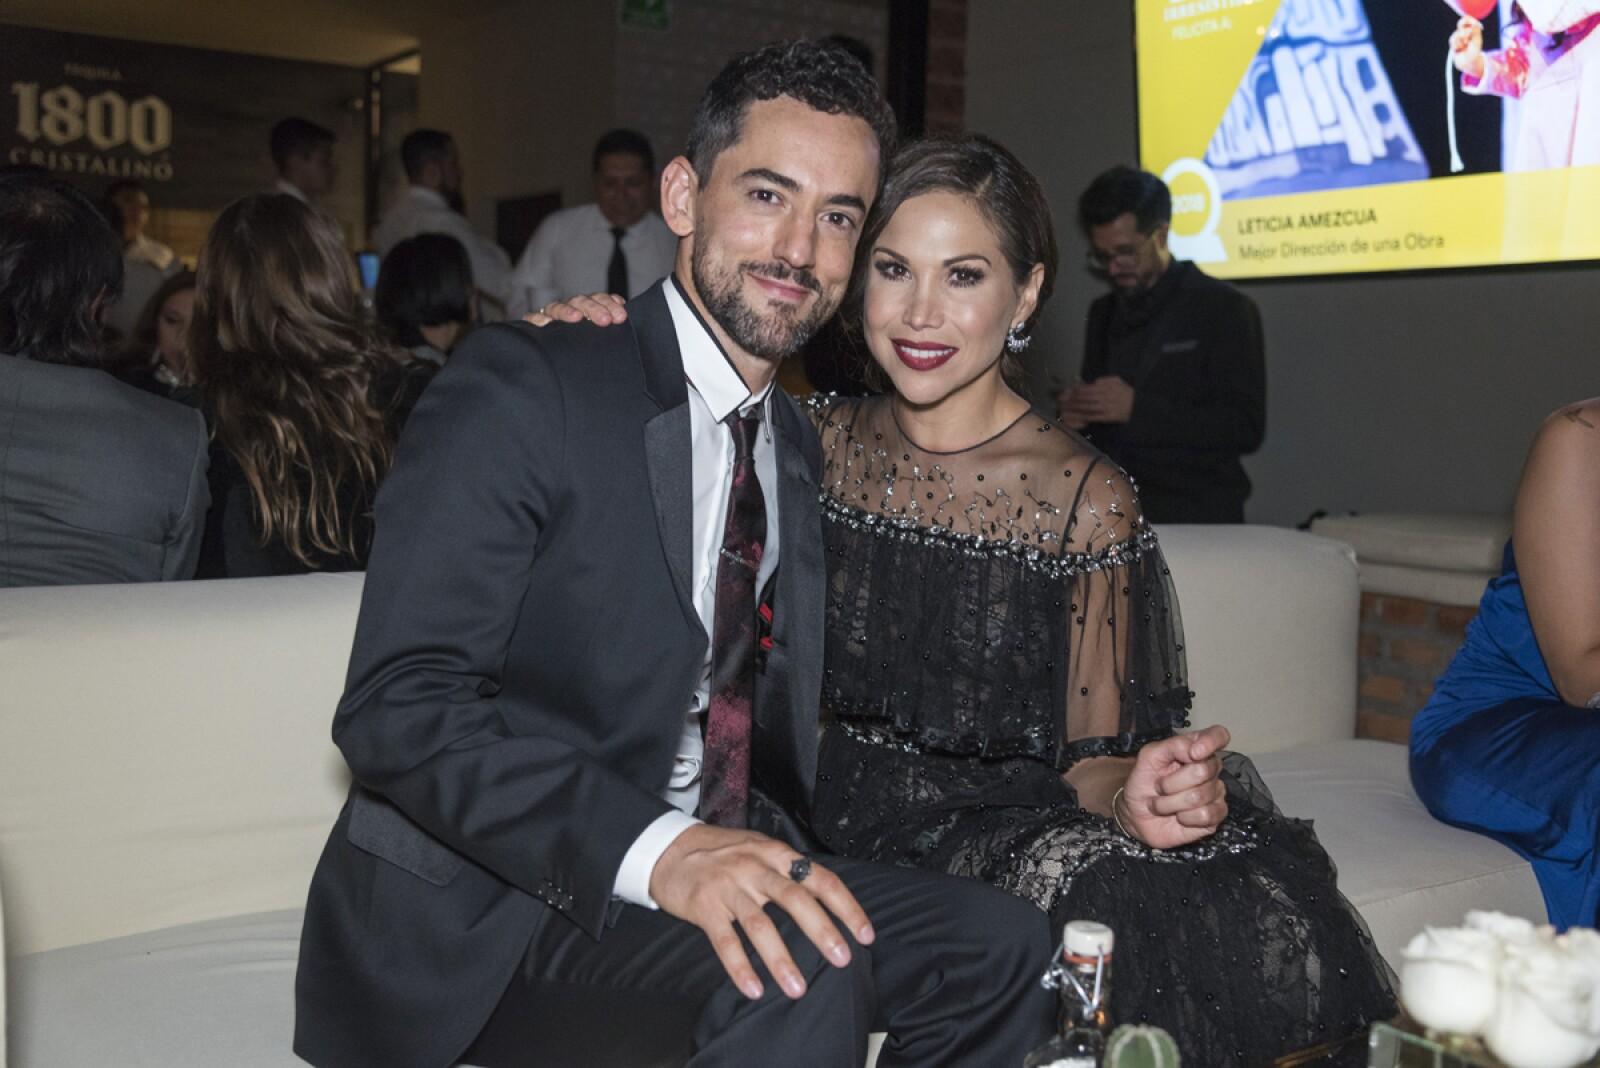 Qui, premios metropolitanos,28 agosto 2018, Nancy López,015.jpg